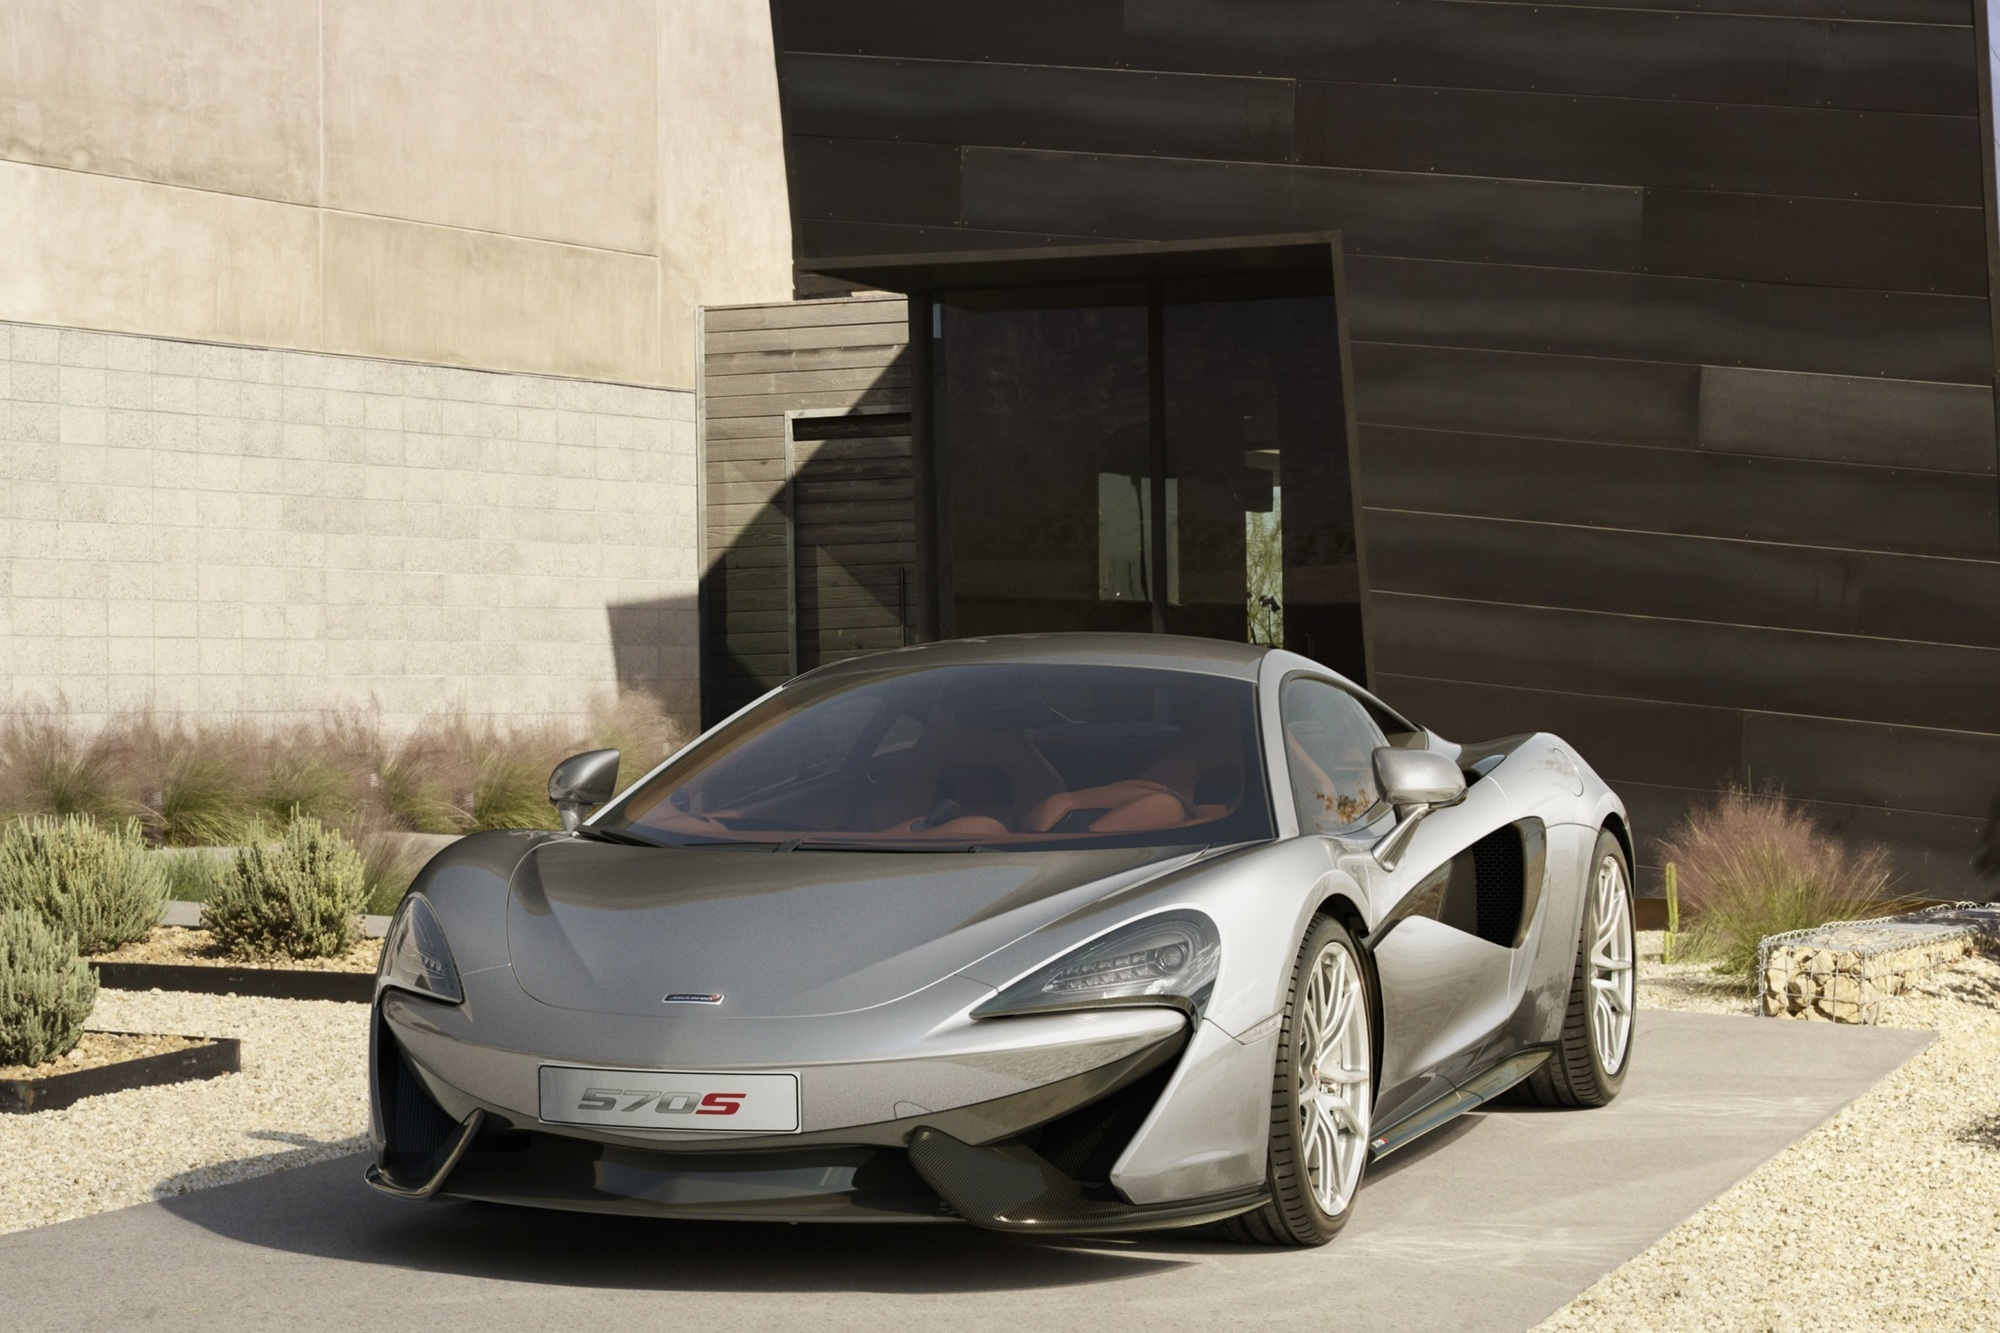 McLaren 570S Coupé - Kraftvoller Einstieg